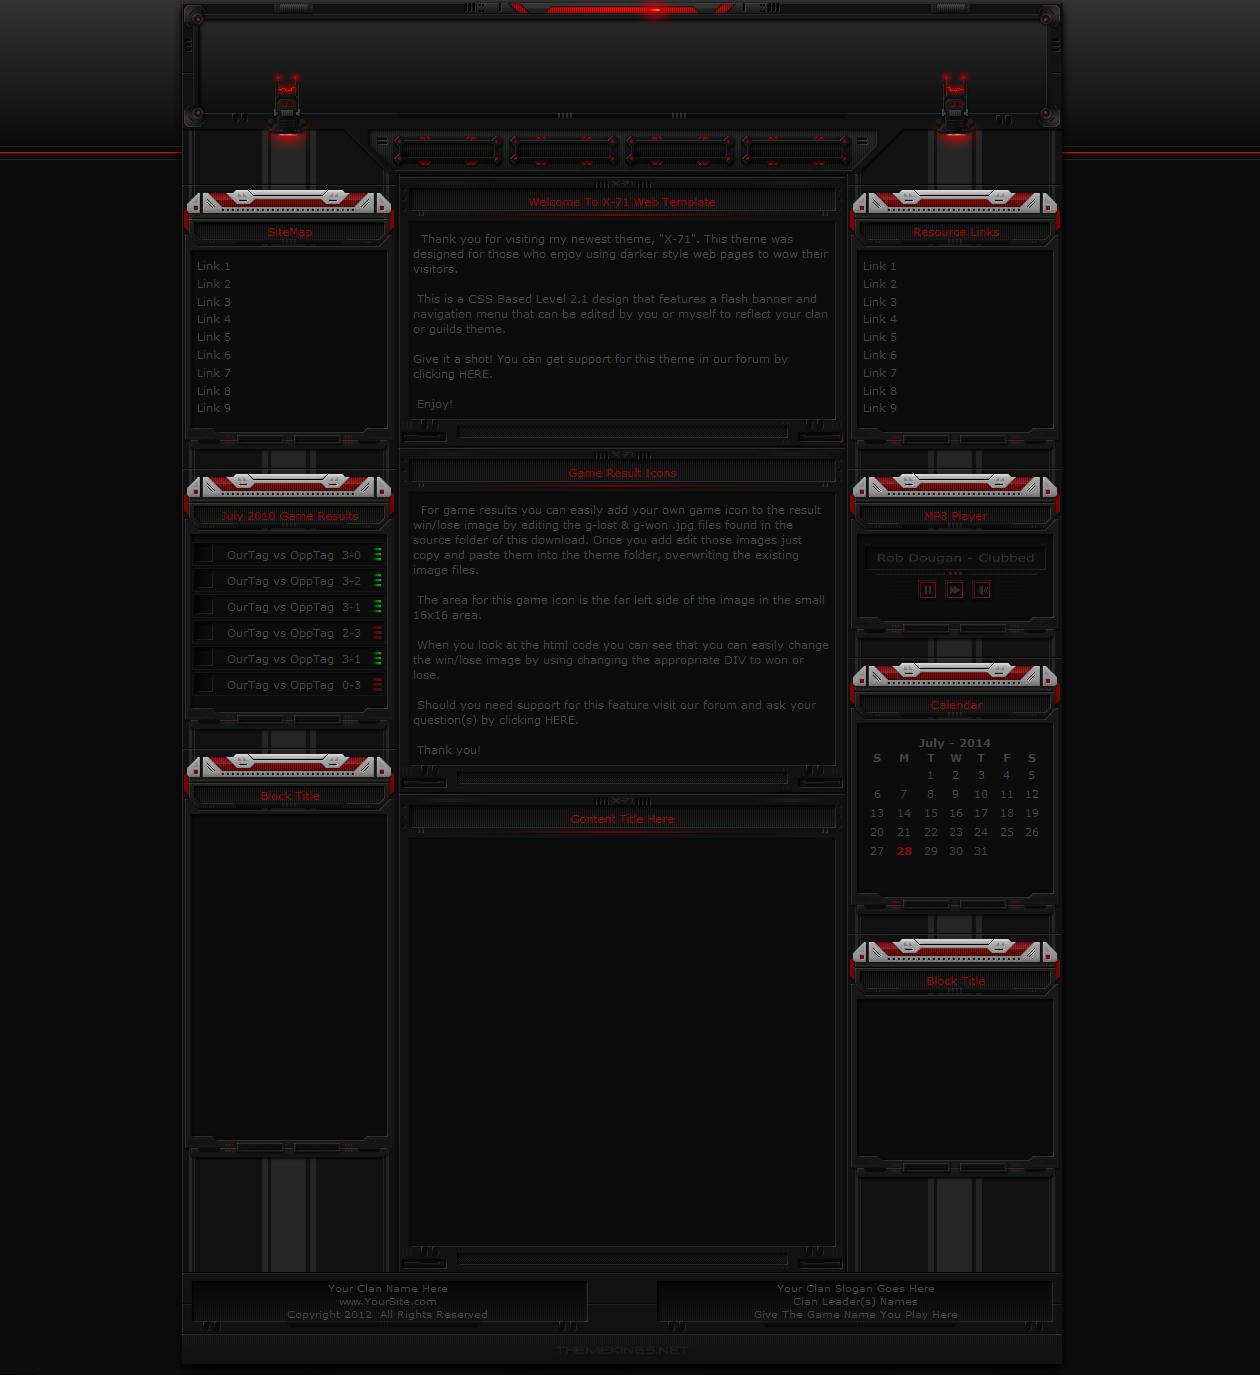 X-71 Gaming Website Theme by ThemeKings by themekings